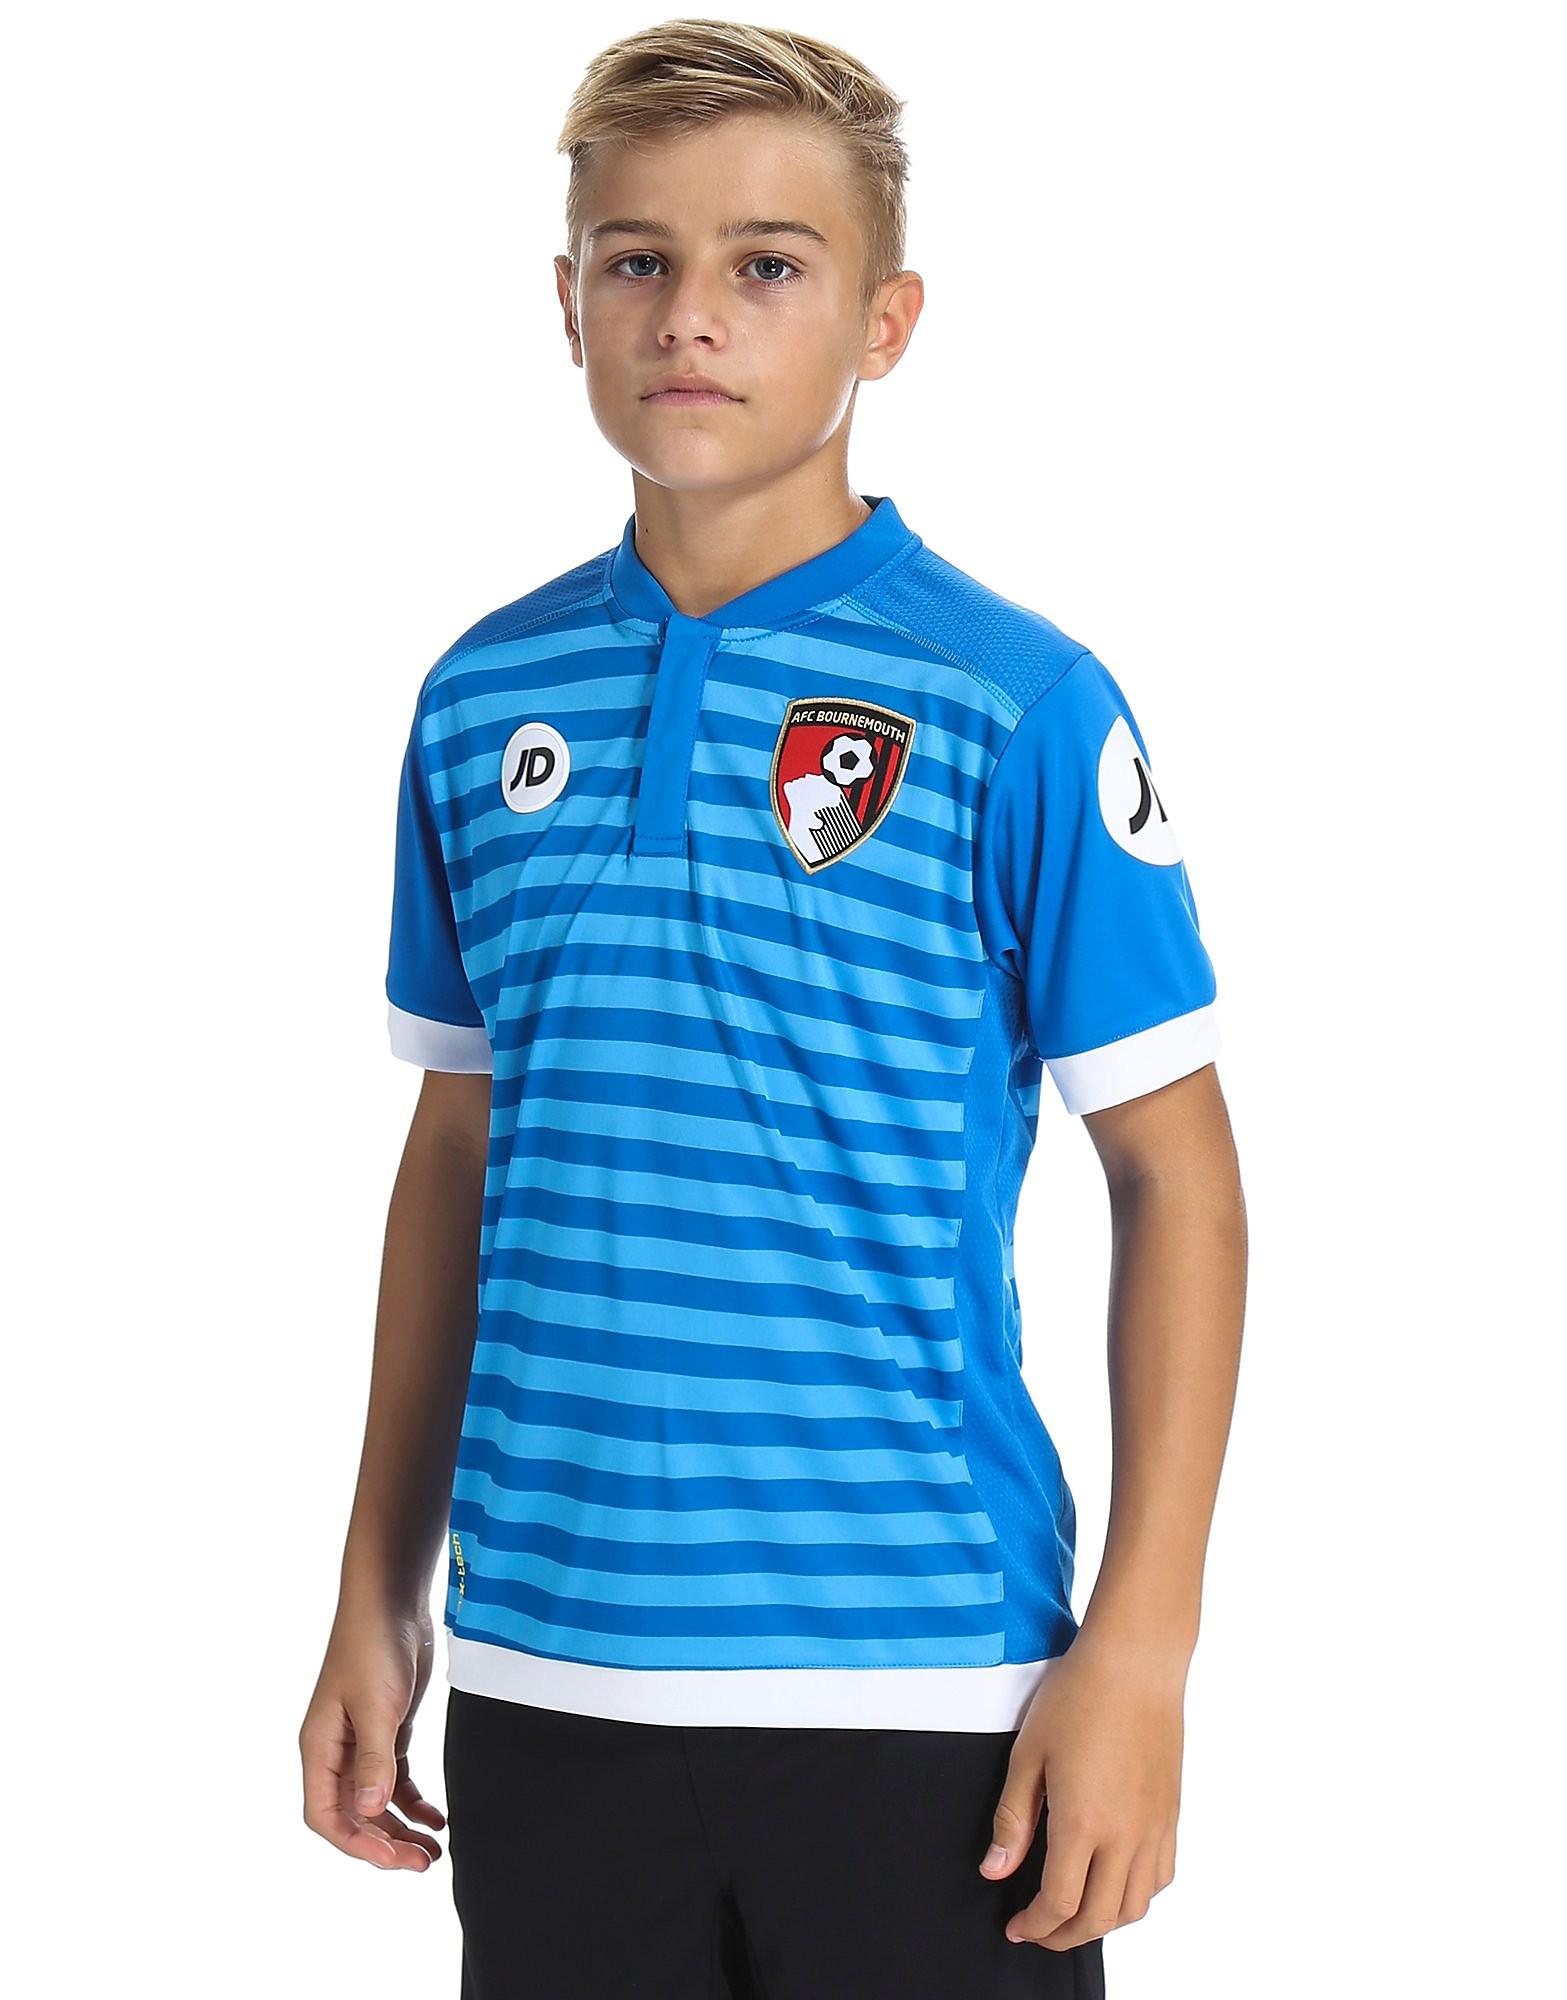 JD AFC Bournemouth 2016/17 Away Shirt Junior